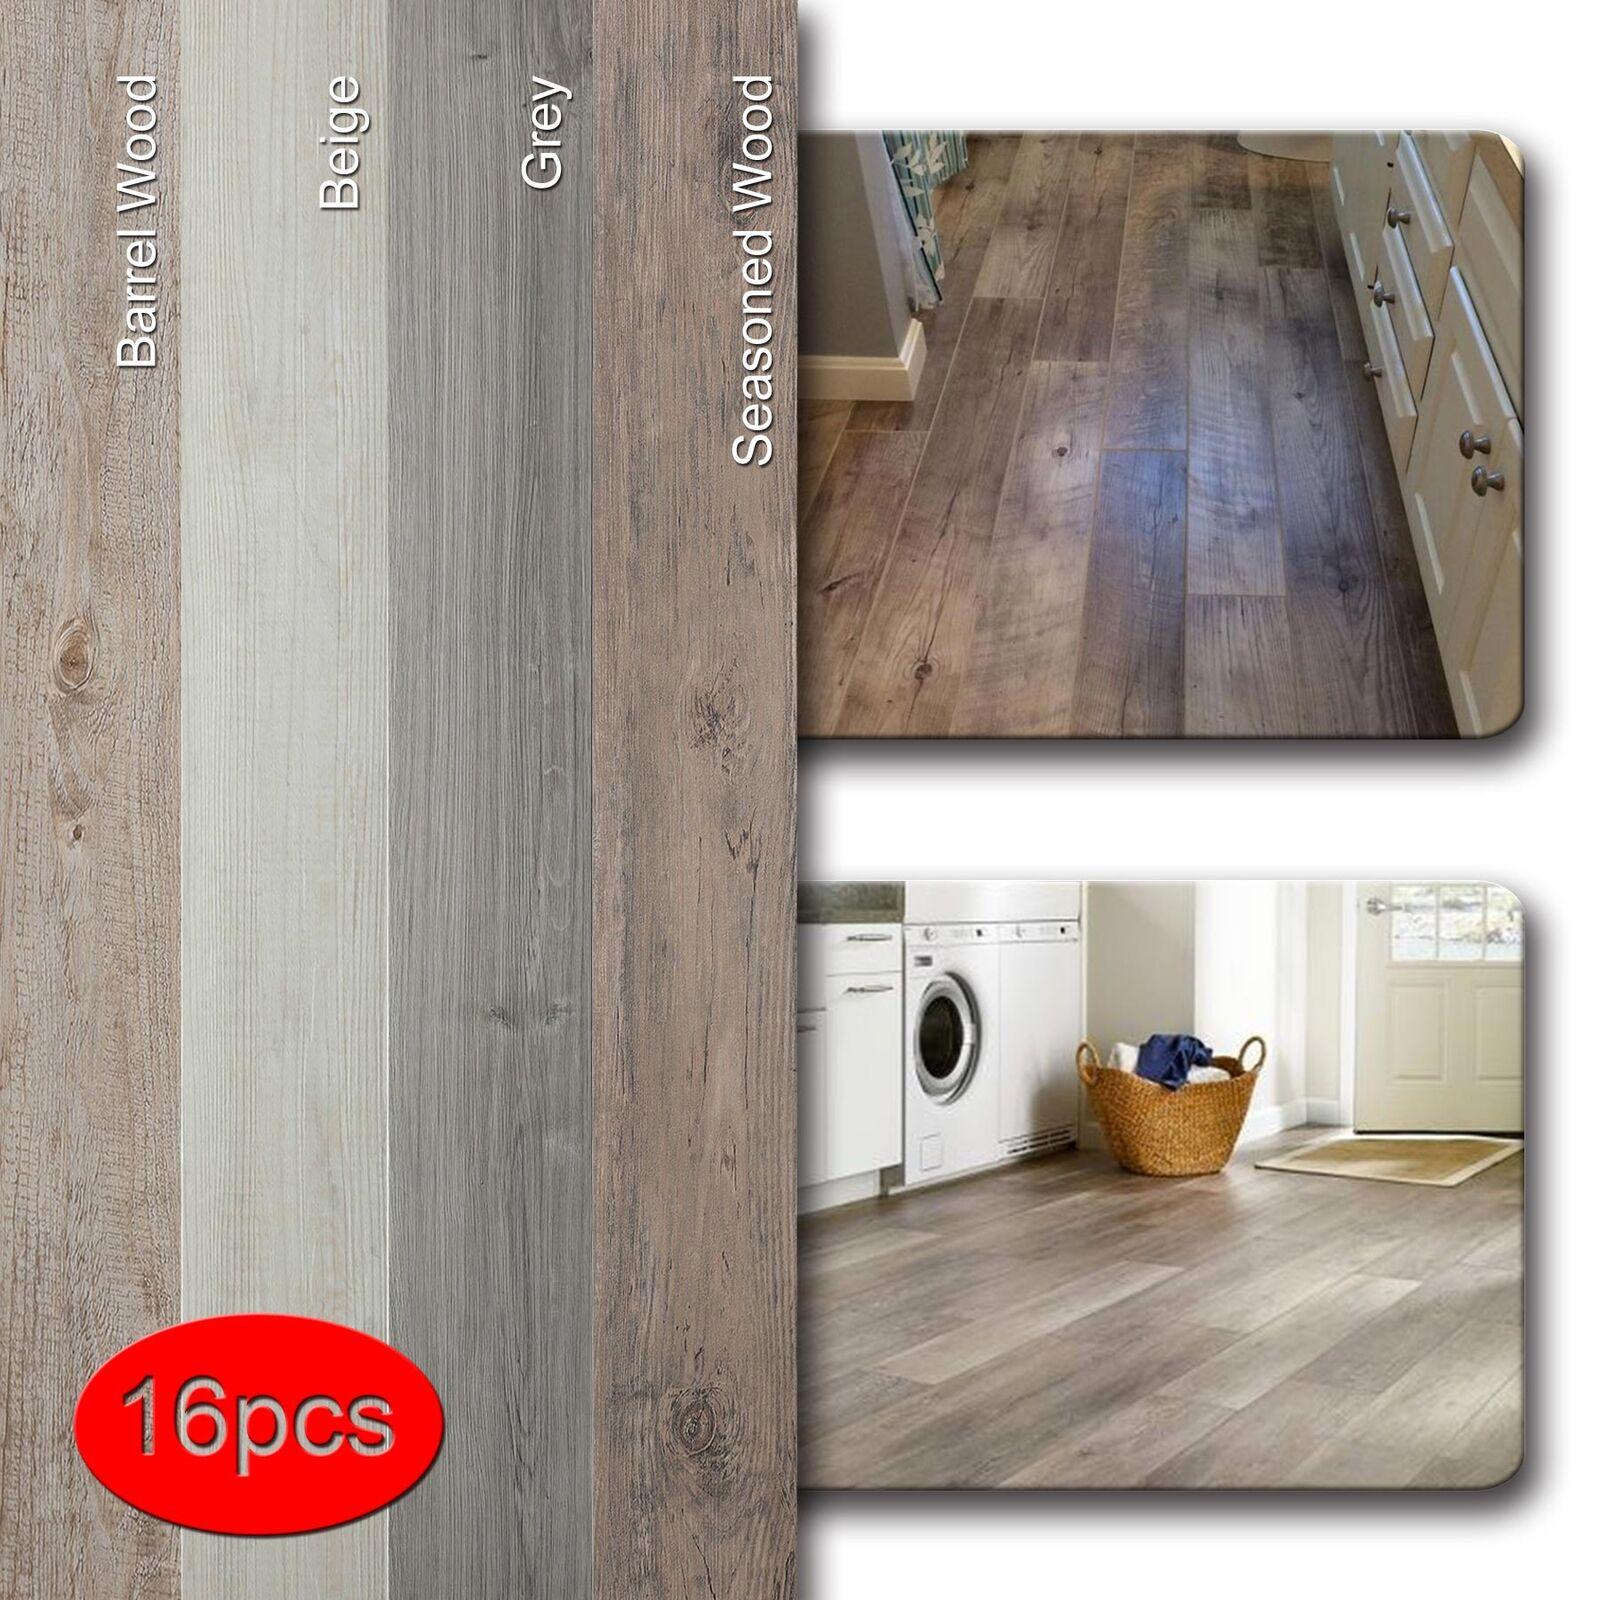 Vinyl Floor Planks Wood Tiles Home Furnishing Peel Stick Self Adhesive 16pcs Ebay